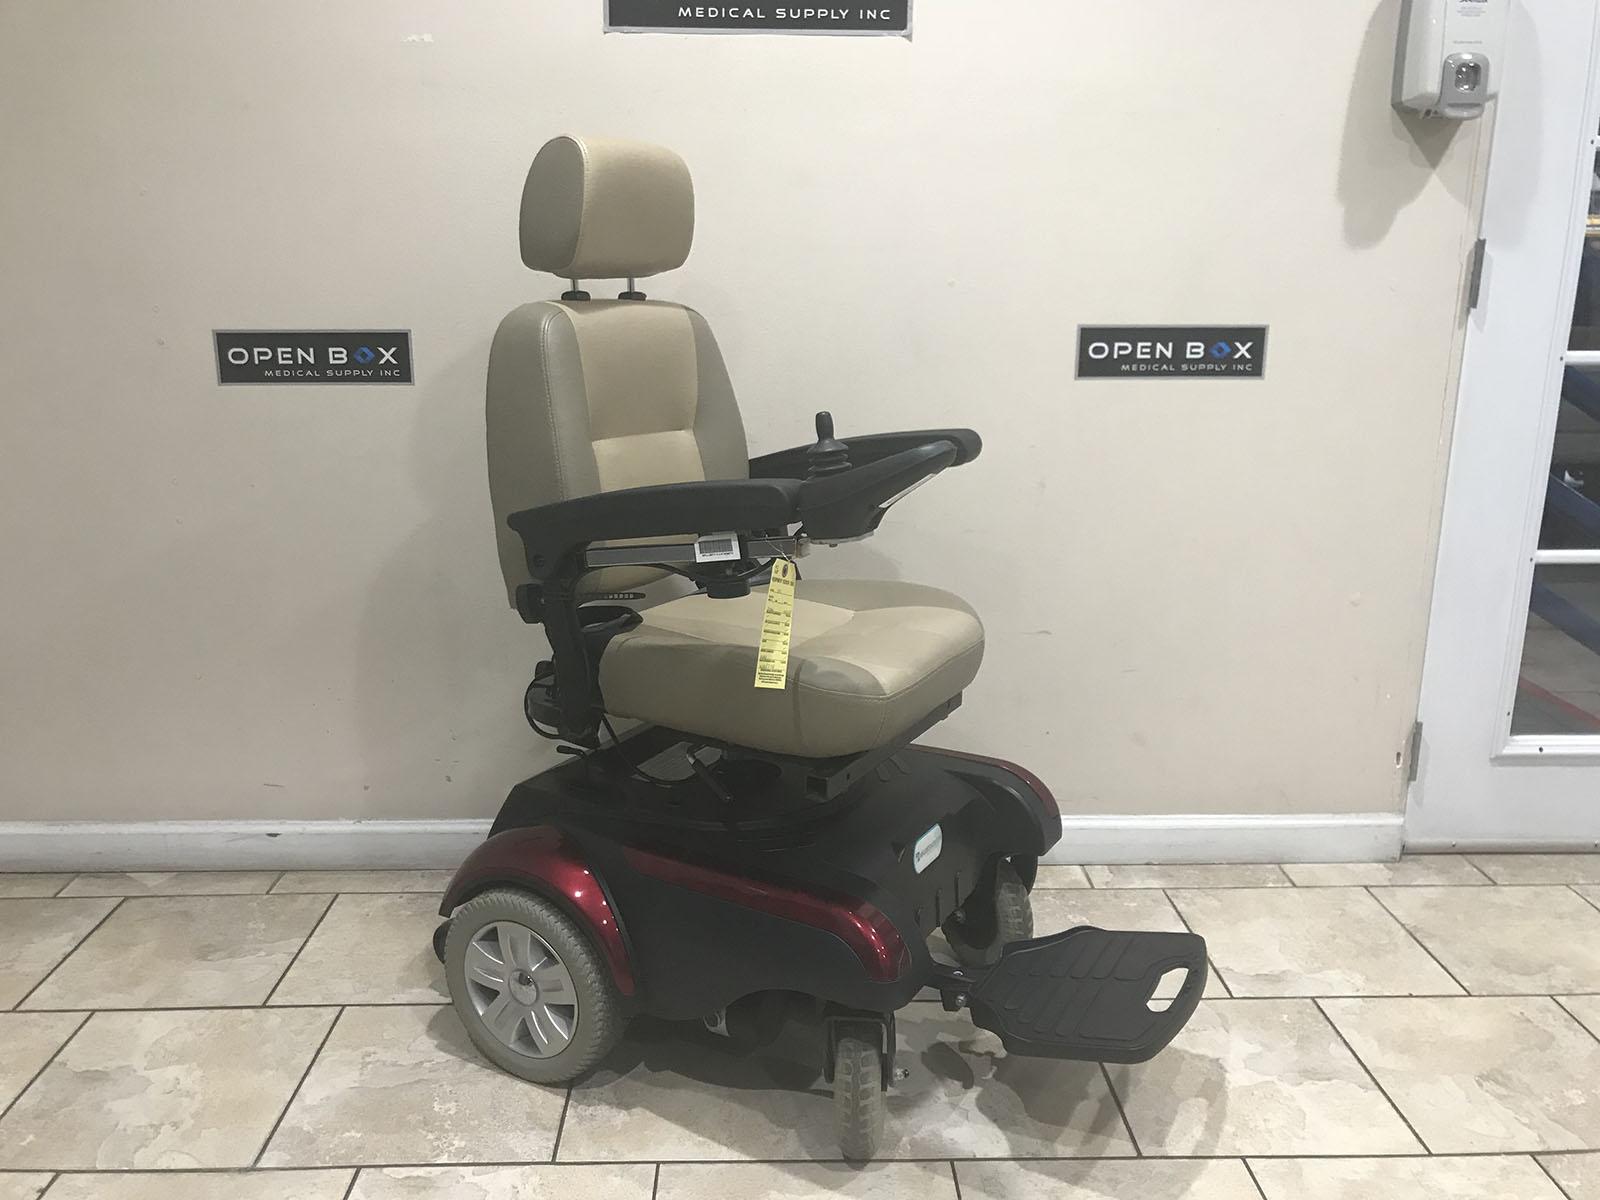 liberty 312 power chair handicap shower chairs rear wheel wheelchair used